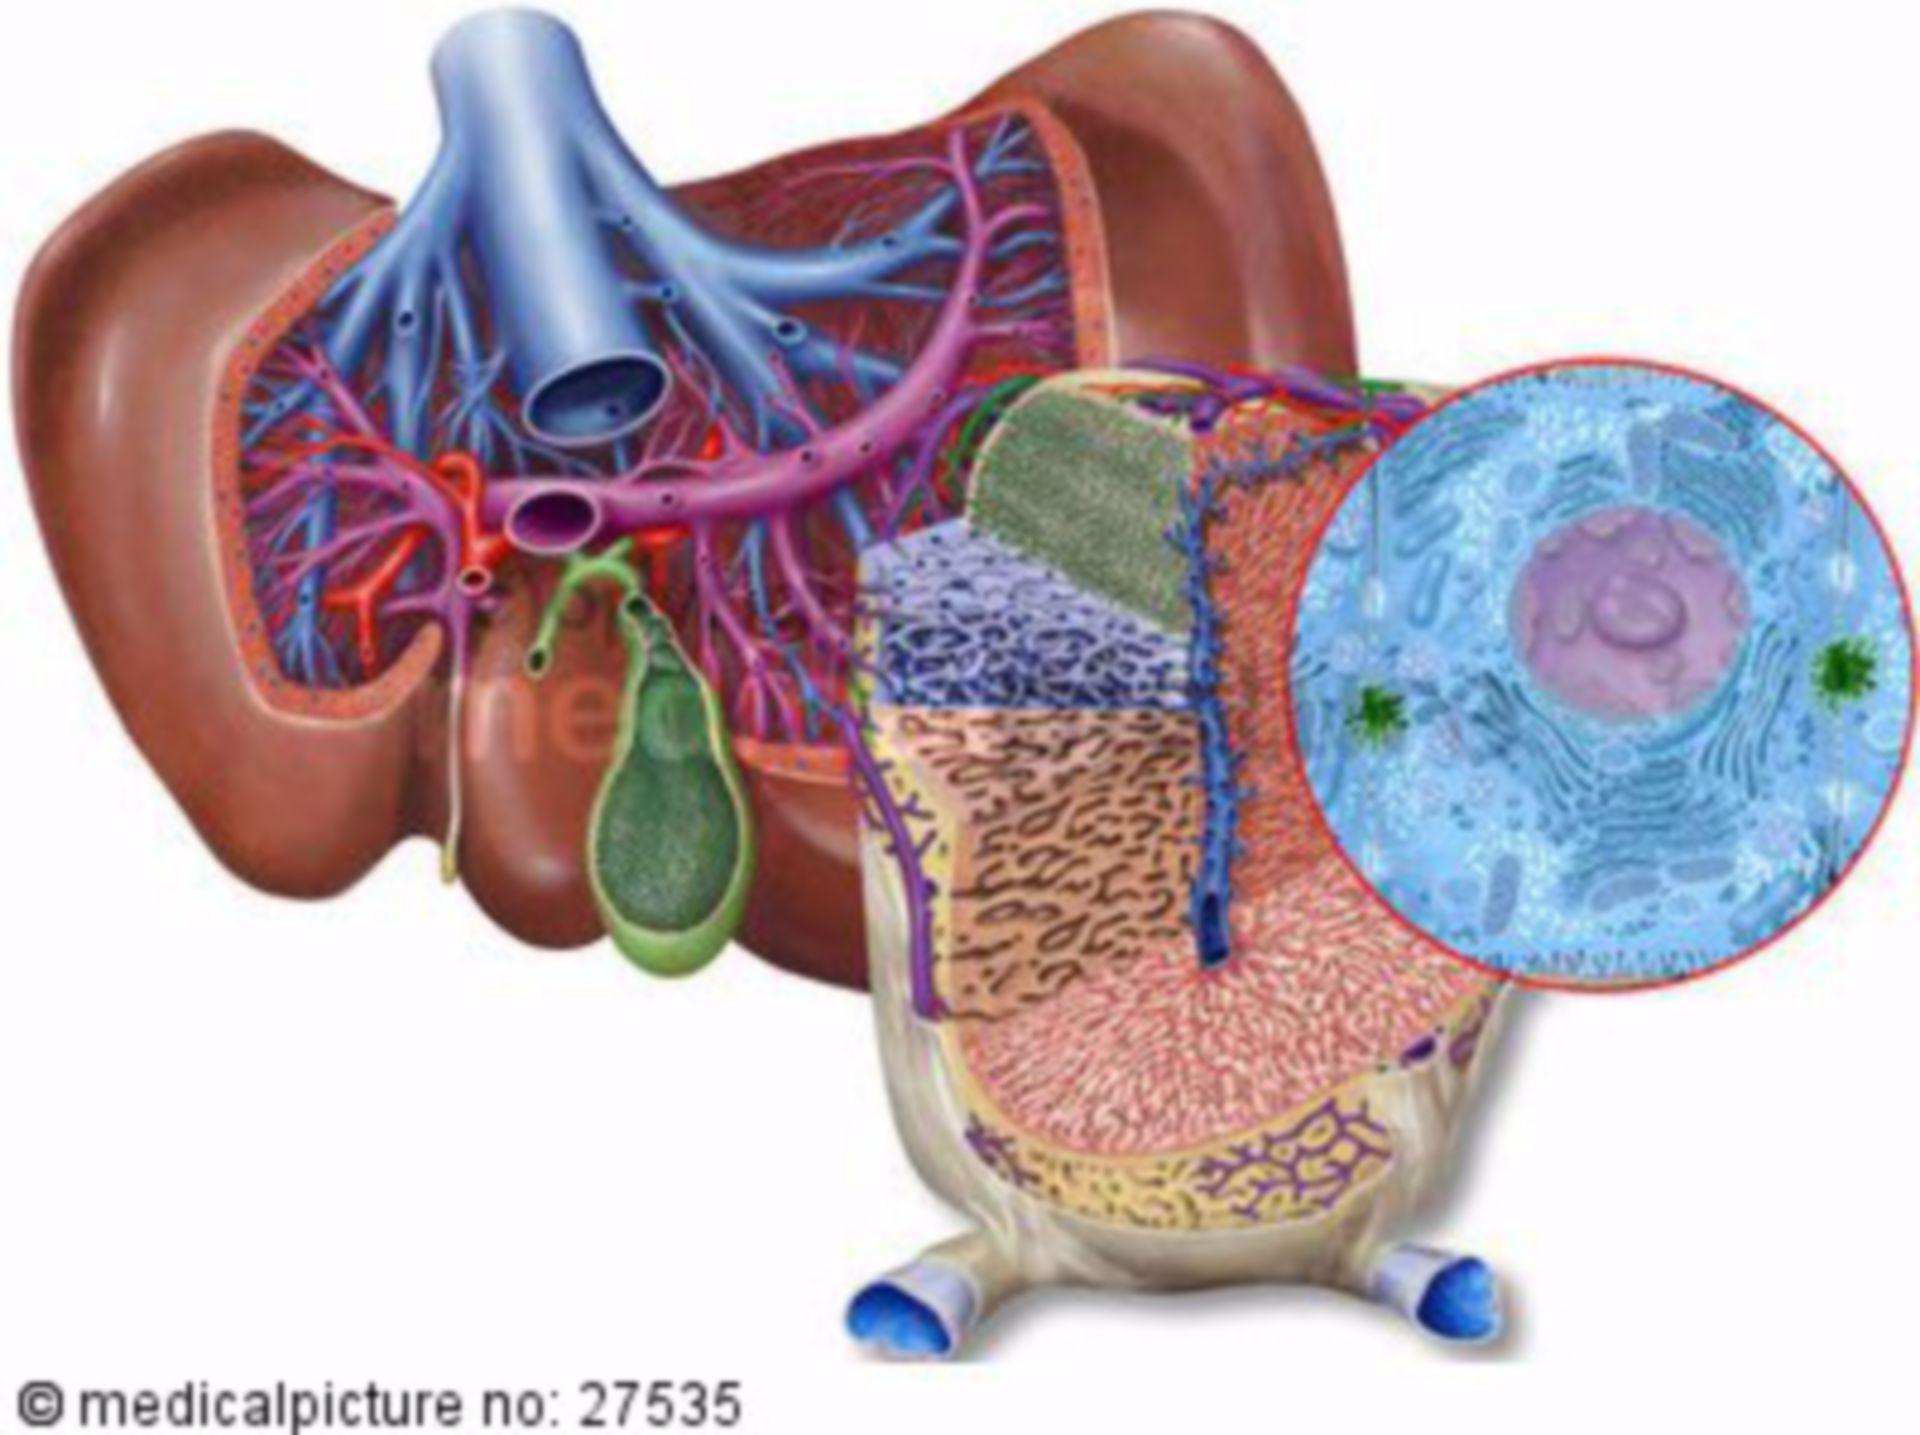 Liver lobule with hepatocytes